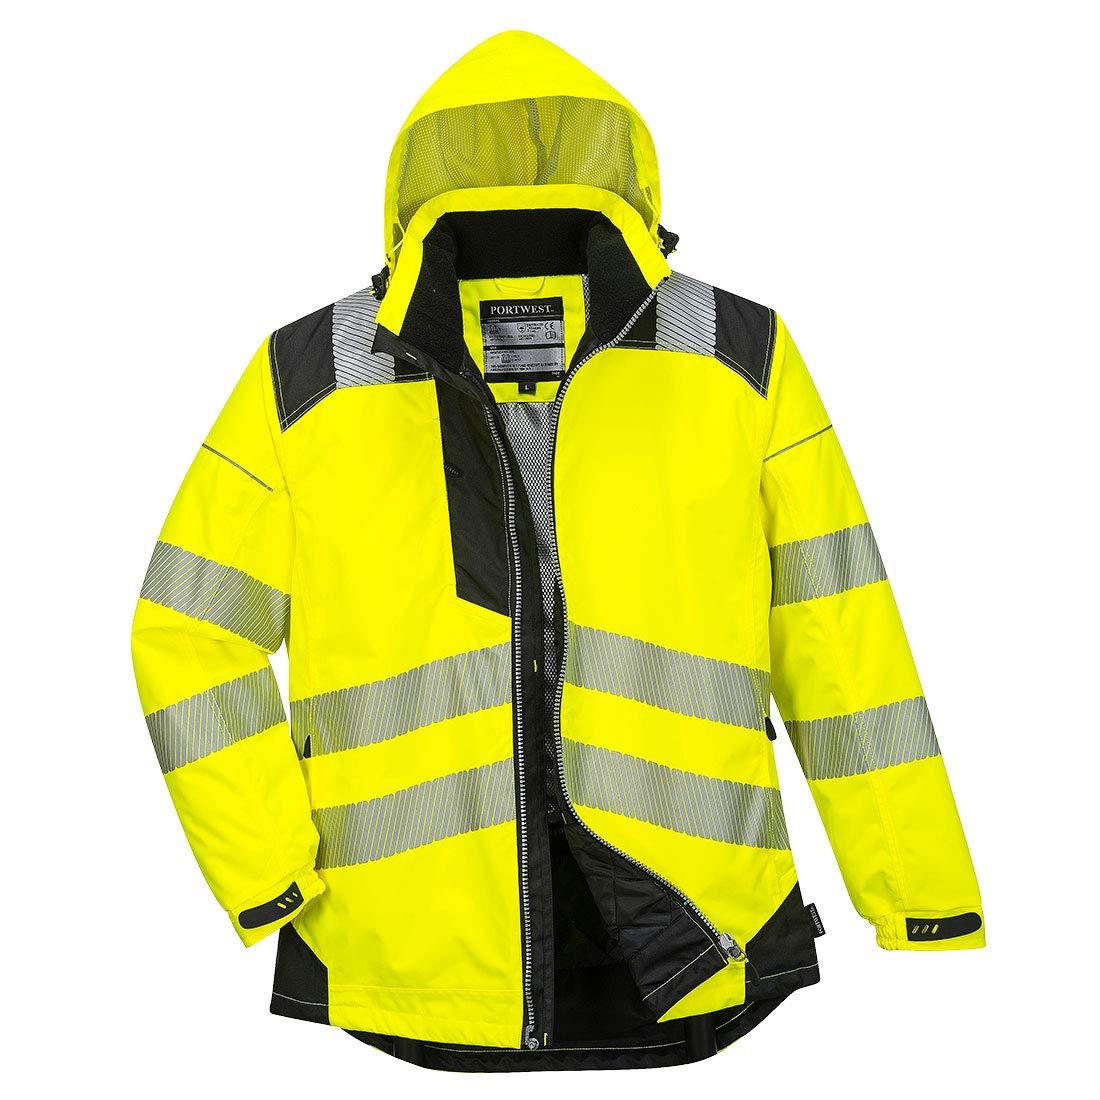 Portwest PW3 Hi-Vis Winter Jacket Work Safety Protective Reflective Waterproof Coat ANSI 3, XXL by Portwest (Image #2)